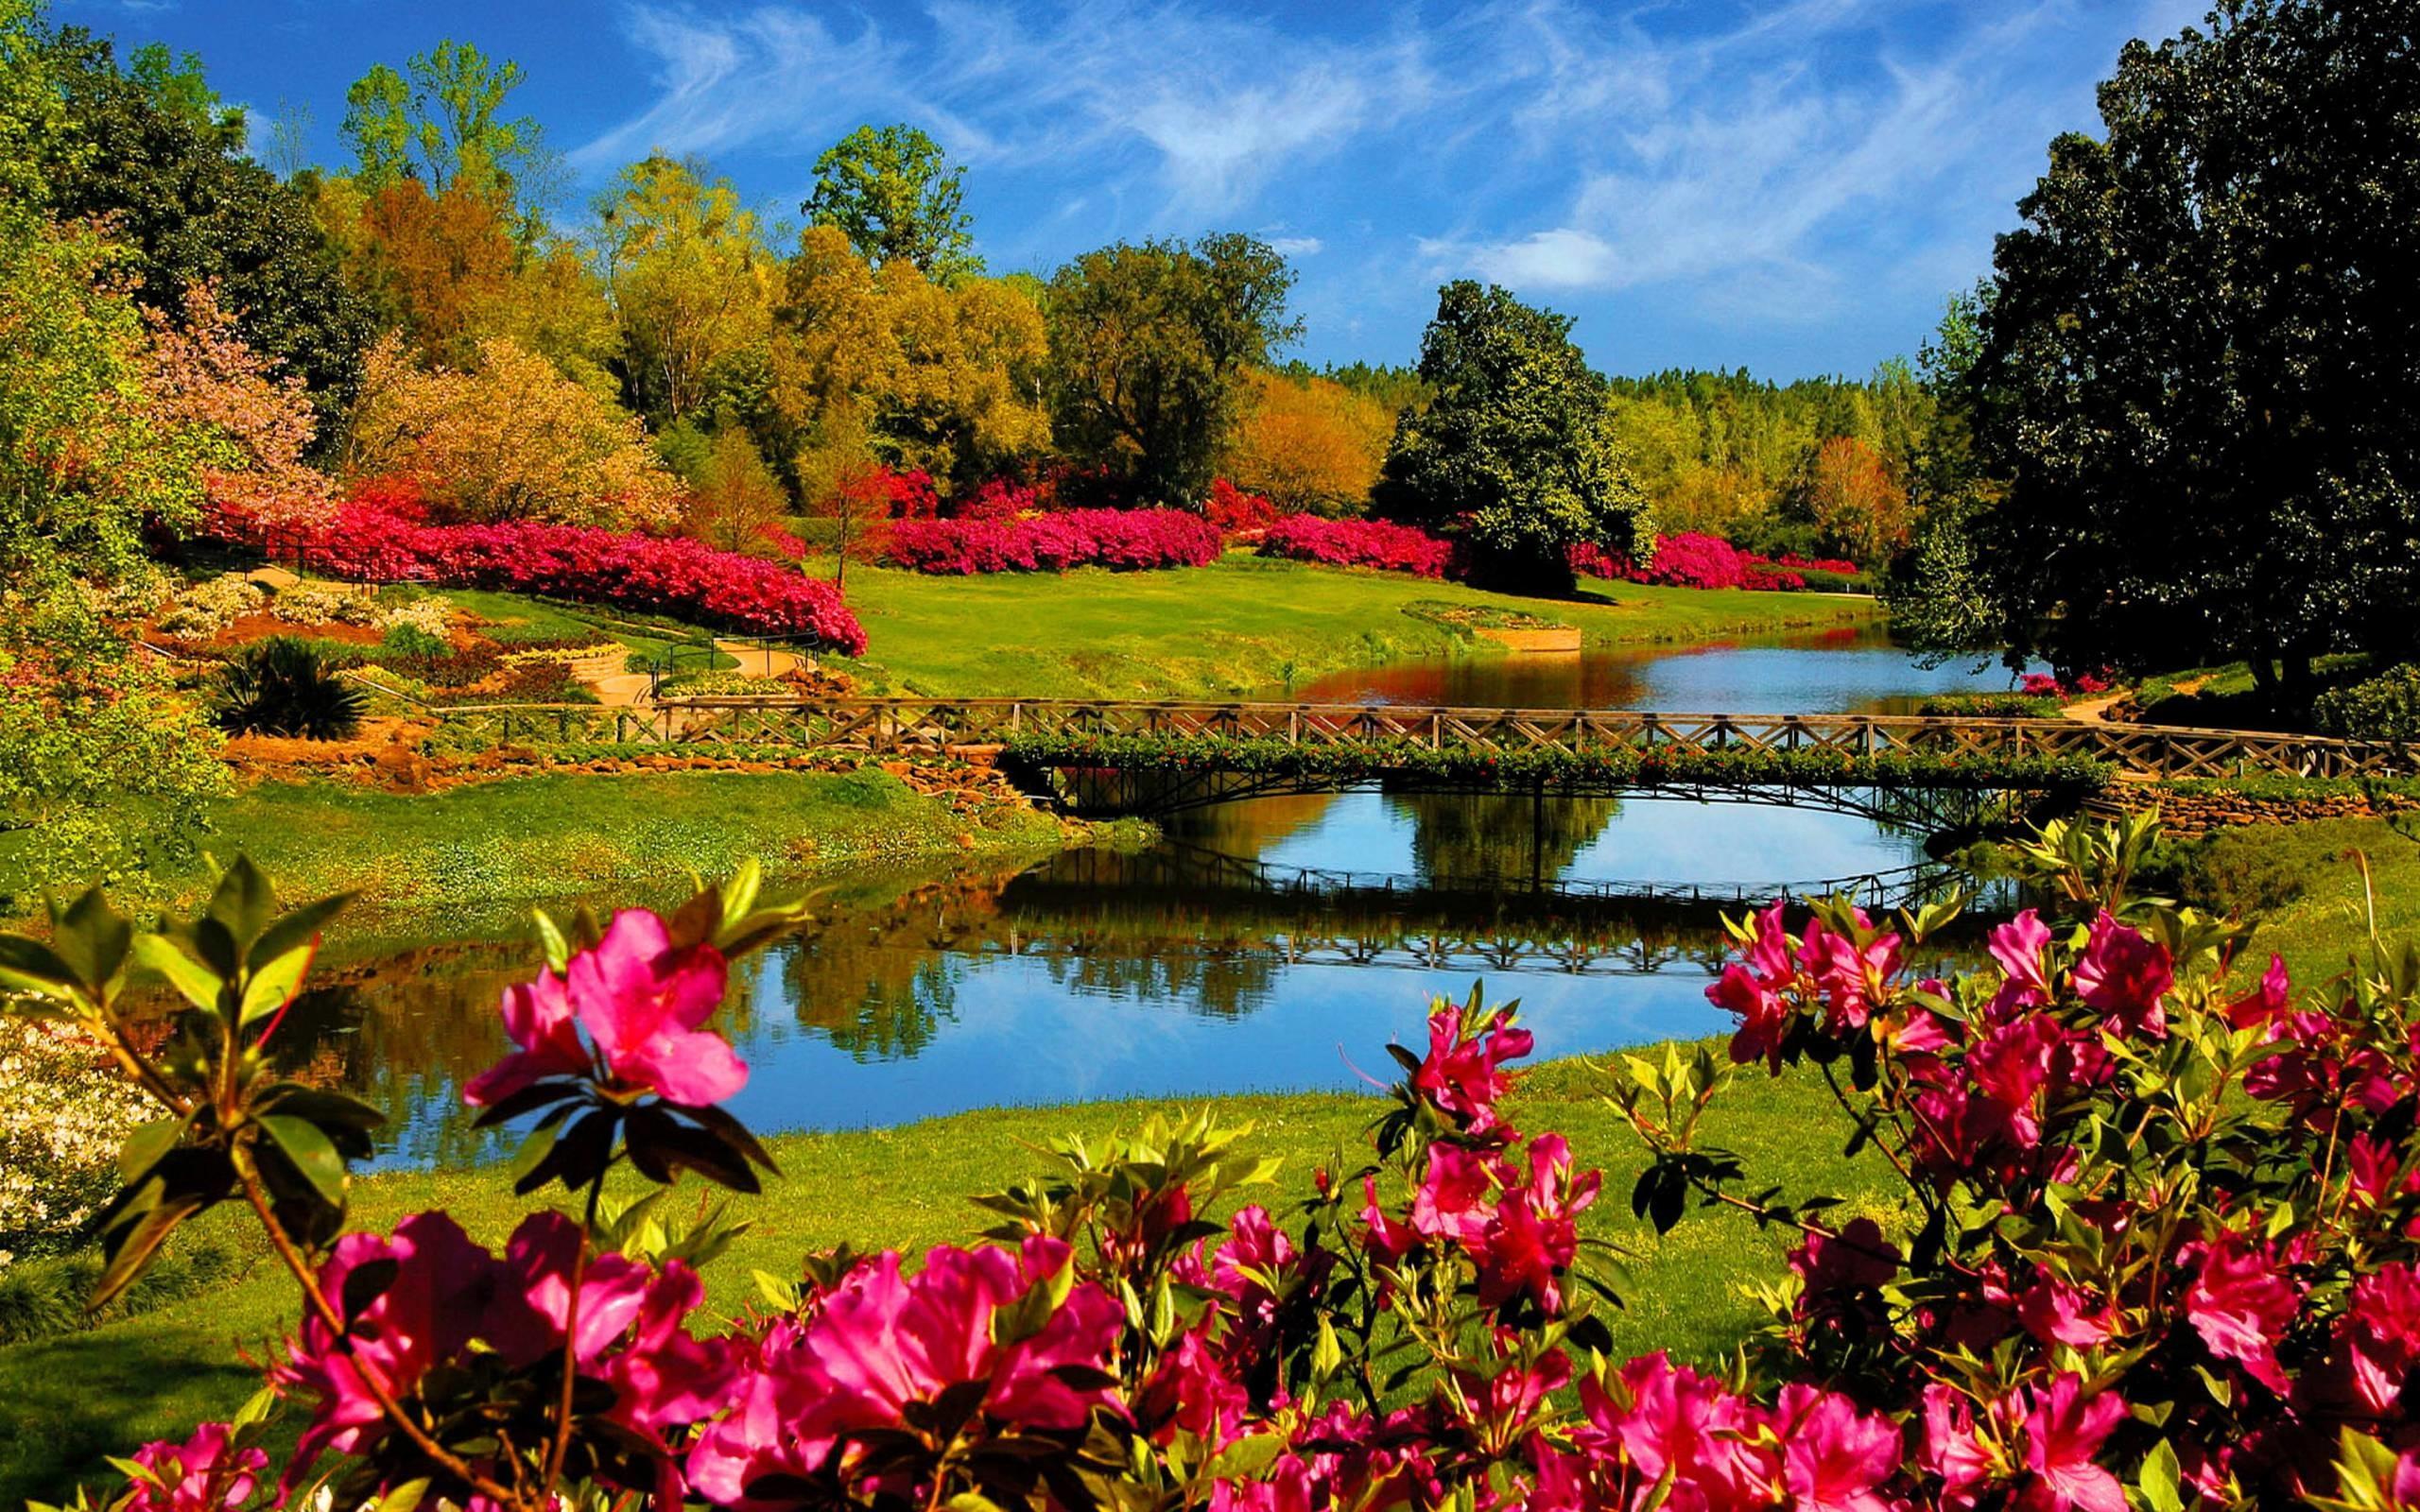 Spring Scenes Desktop Wallpapers – HD Wallpapers Backgrounds of Your .